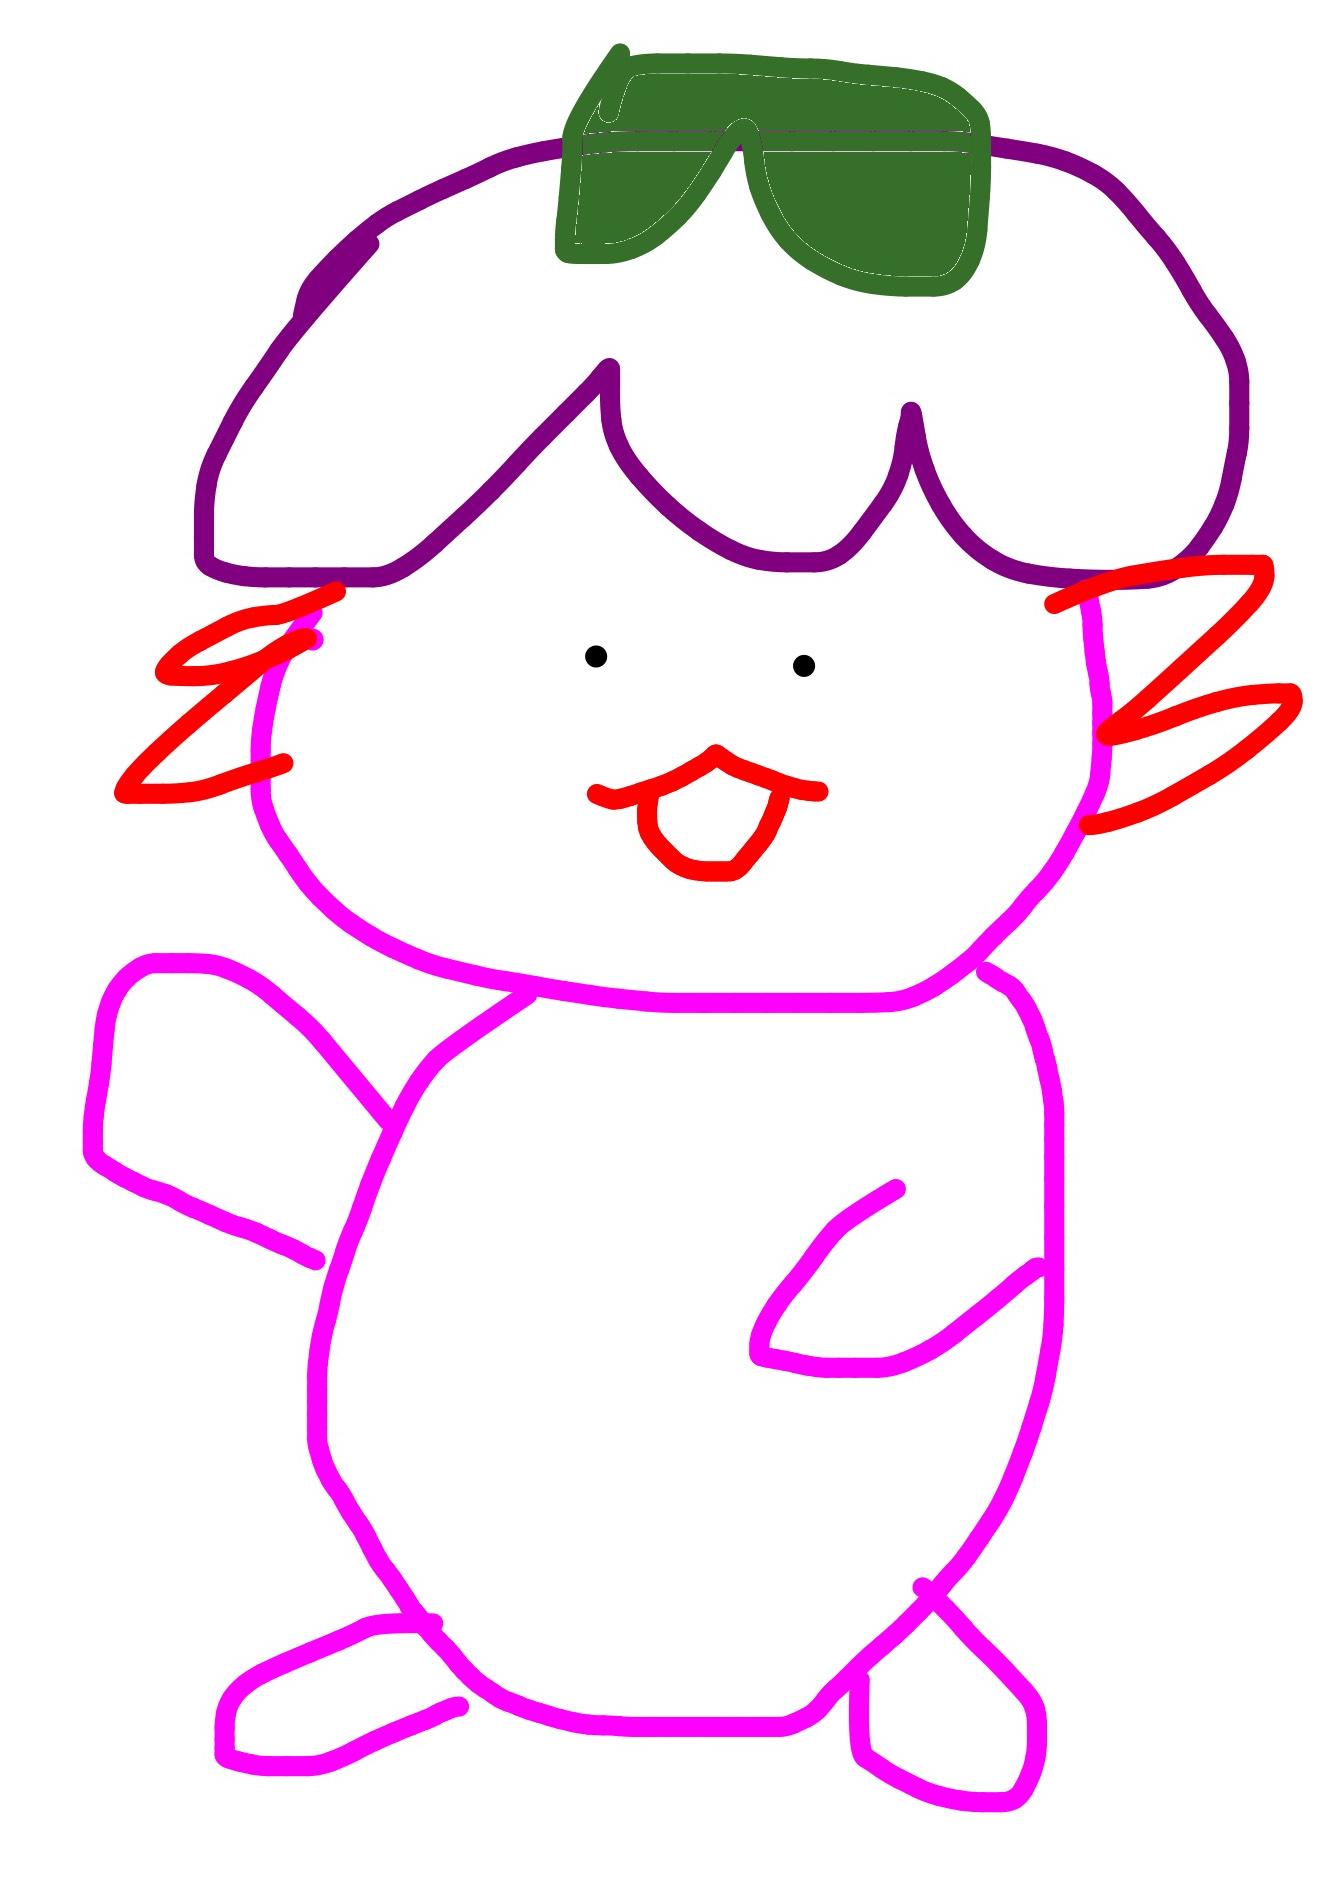 An illustration of Xiaolong the axolotl, simply drawn.